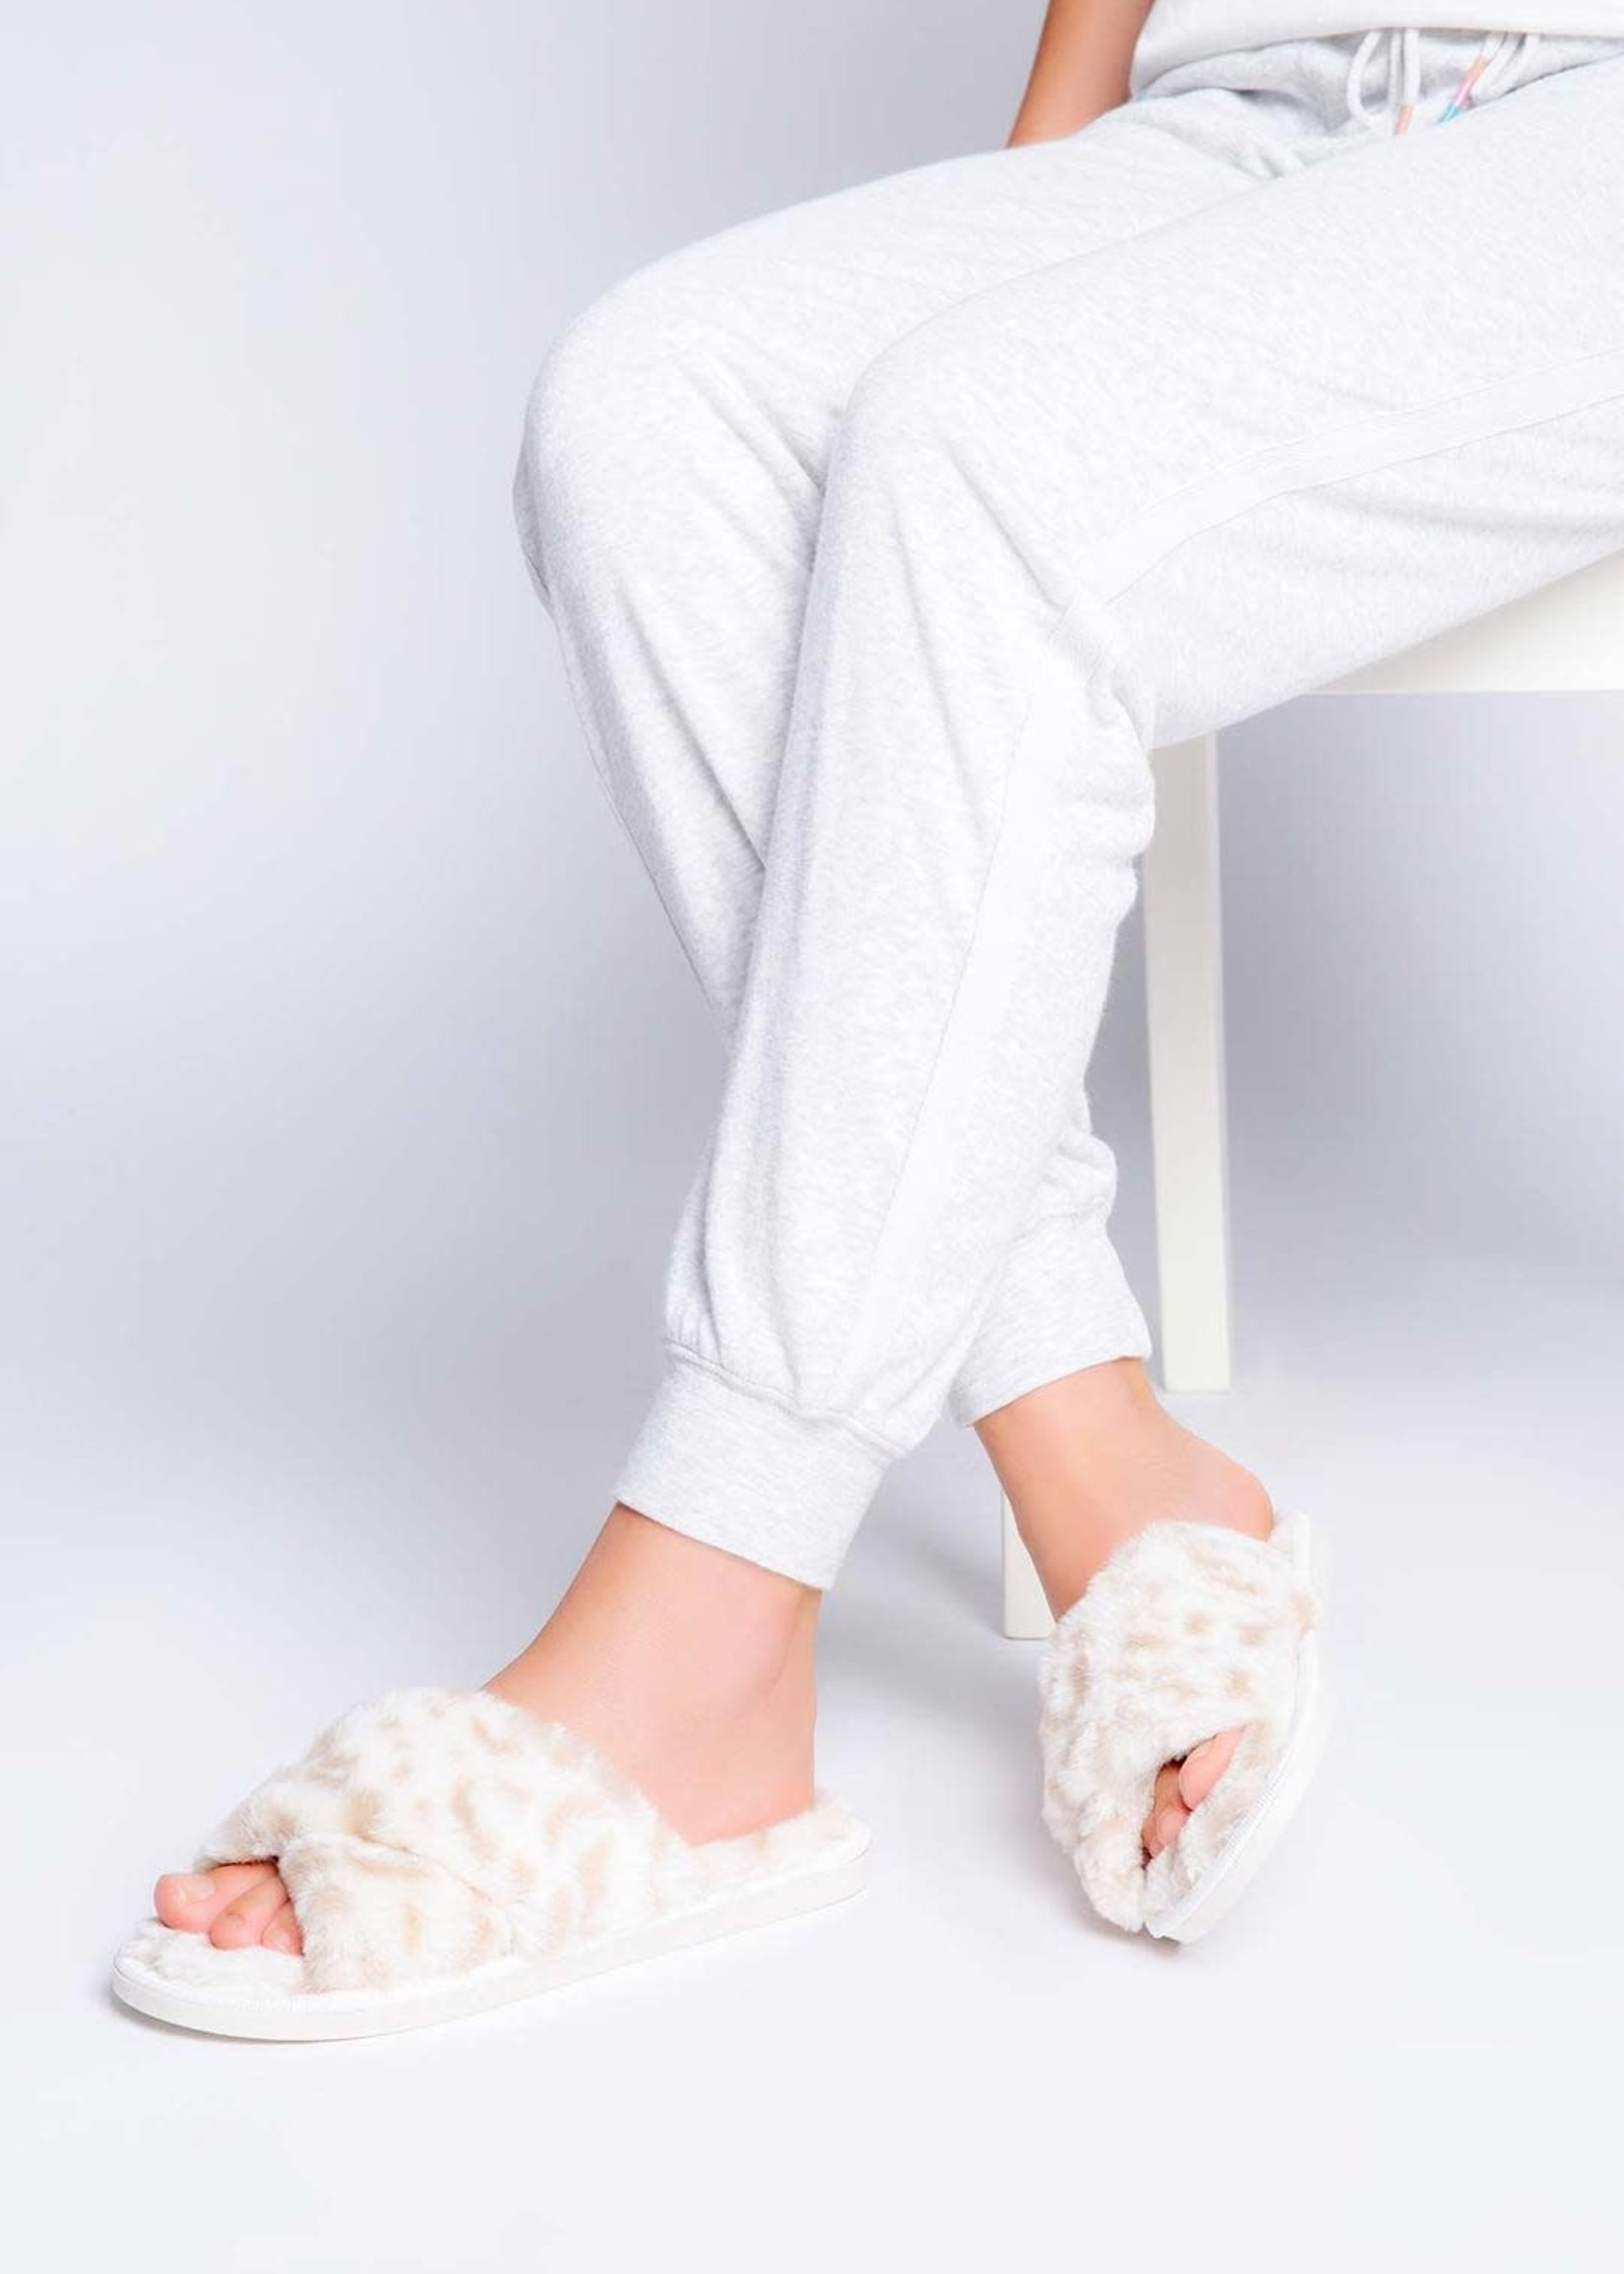 Pj slippers-animal